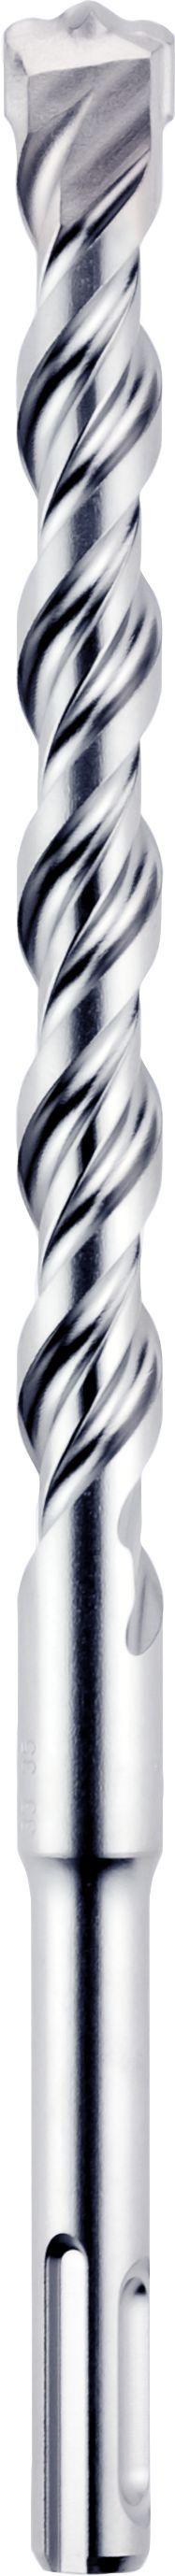 Slika BORER Rocket 3 SDS-plus 18x400-450 mm